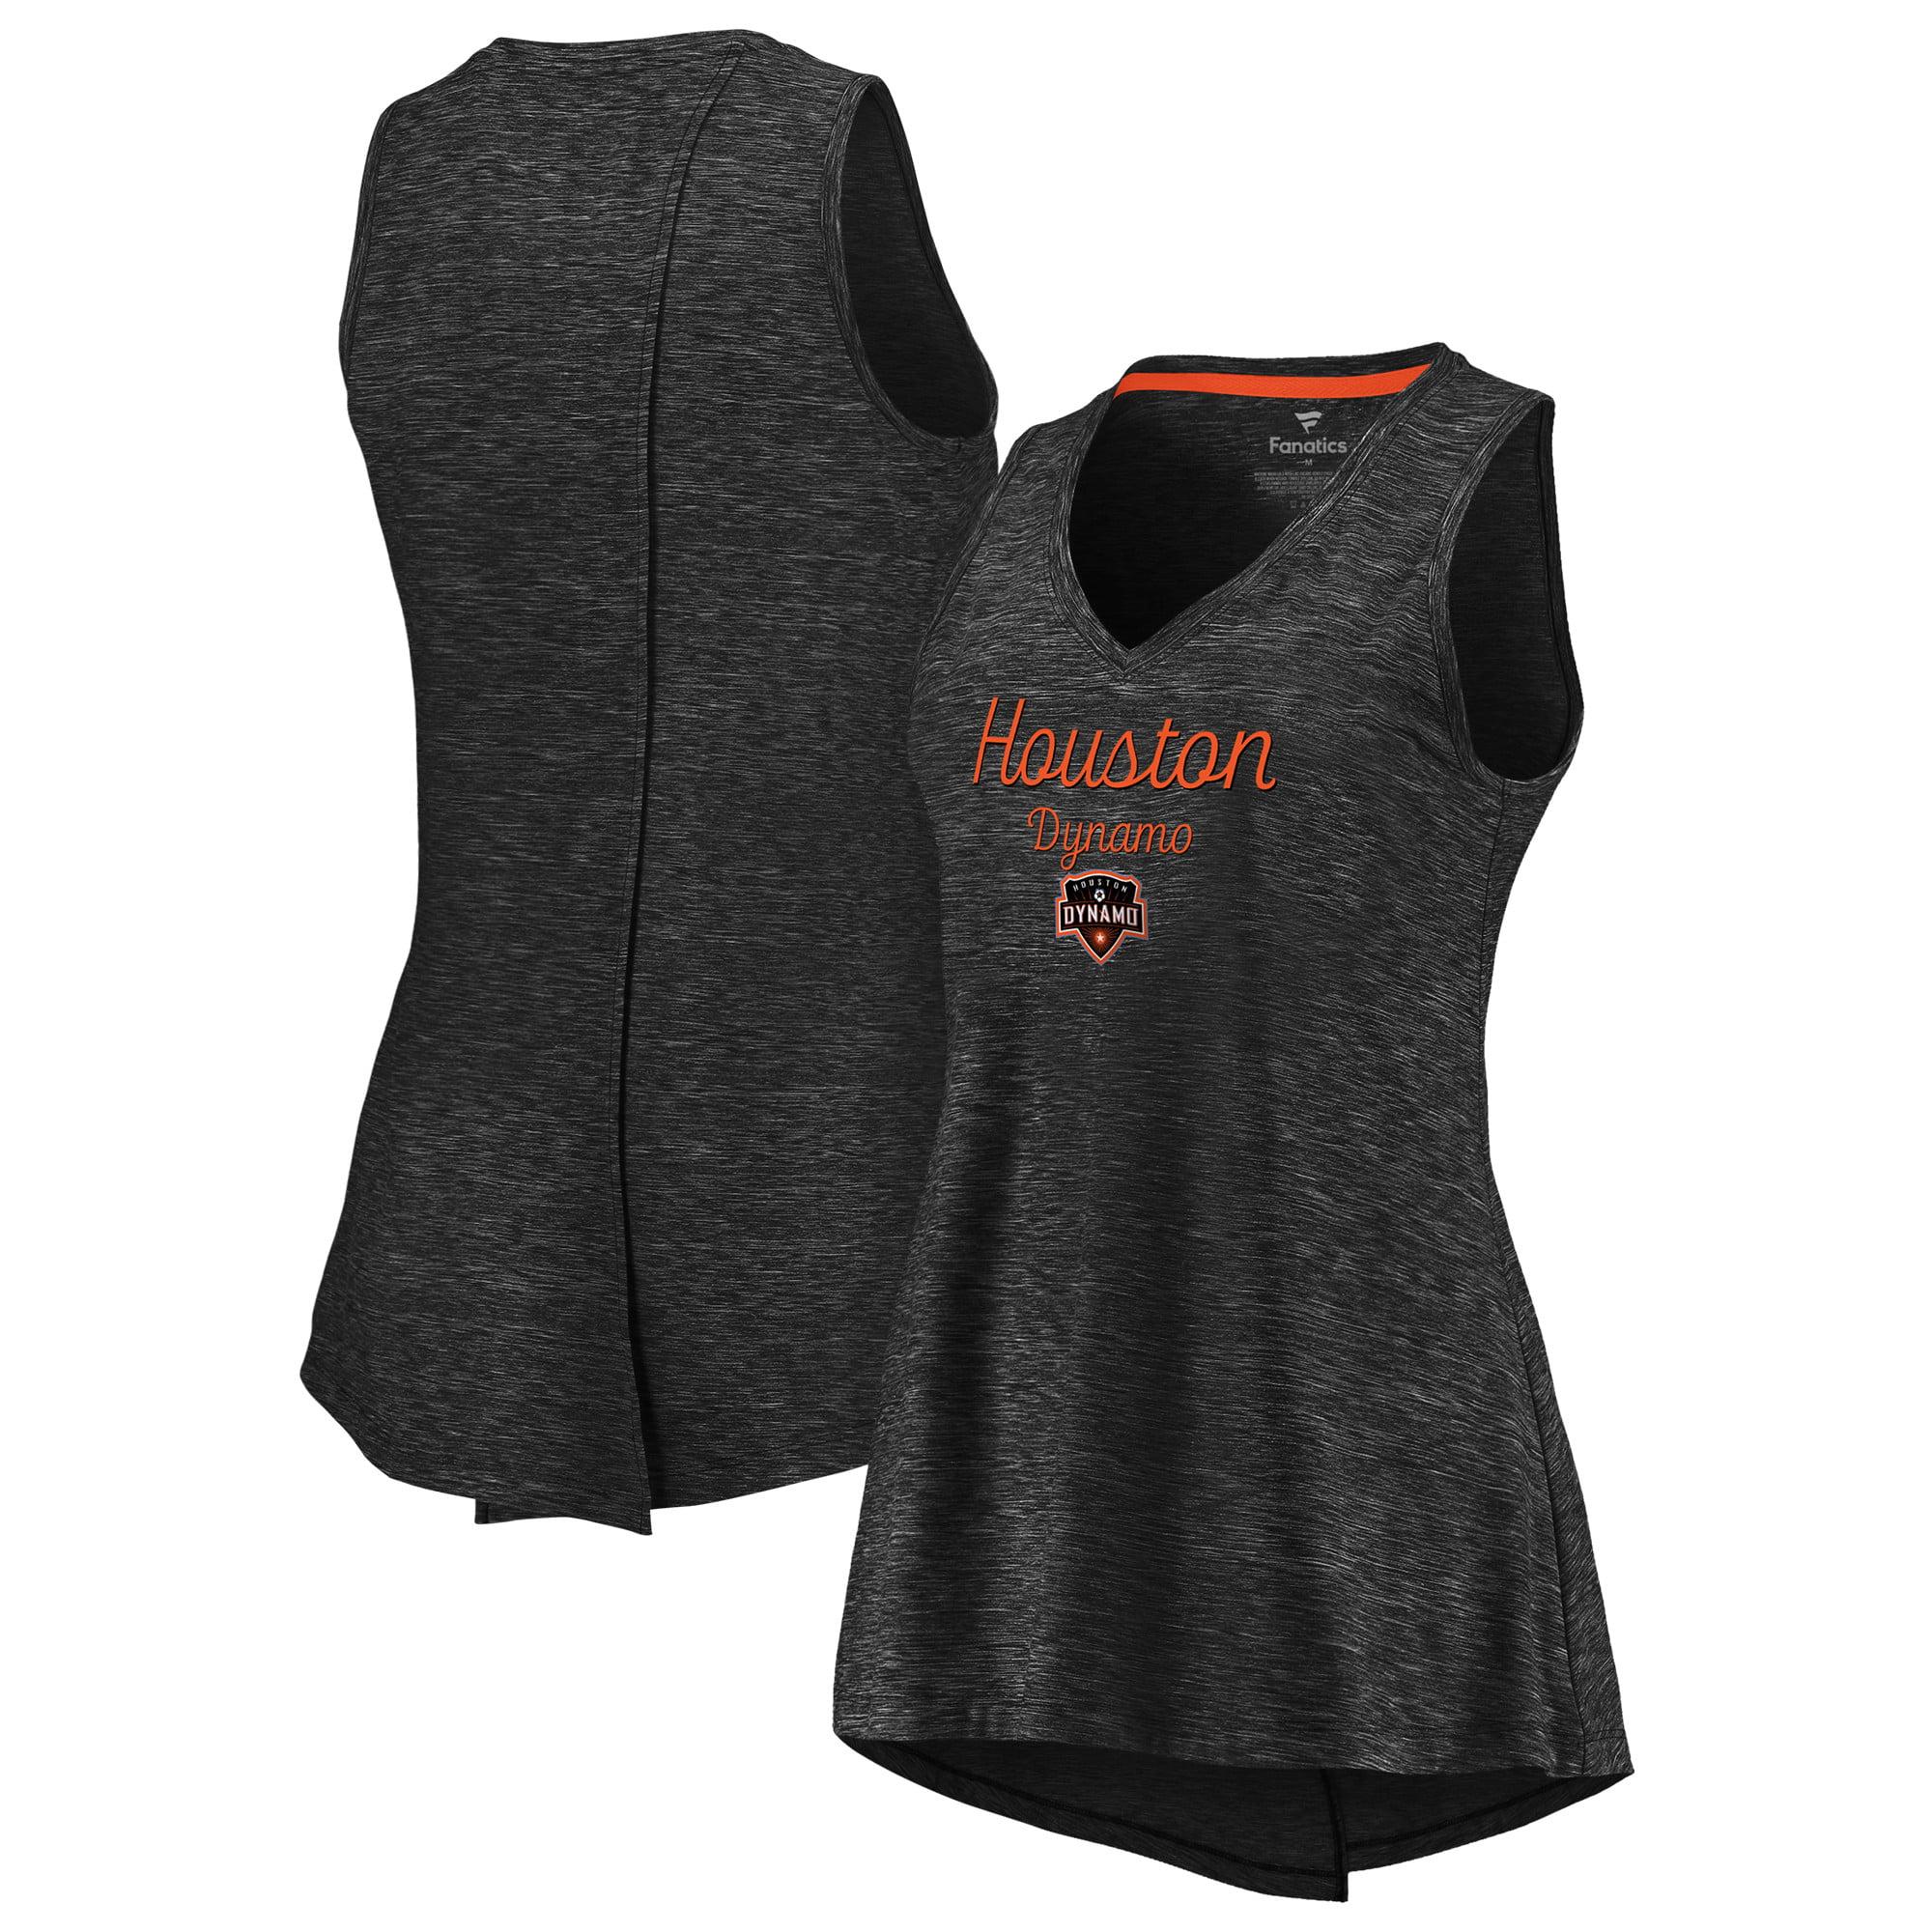 Houston Dynamo Fanatics Branded Women's Premier Obvious Style V-Neck Tank Top - Black